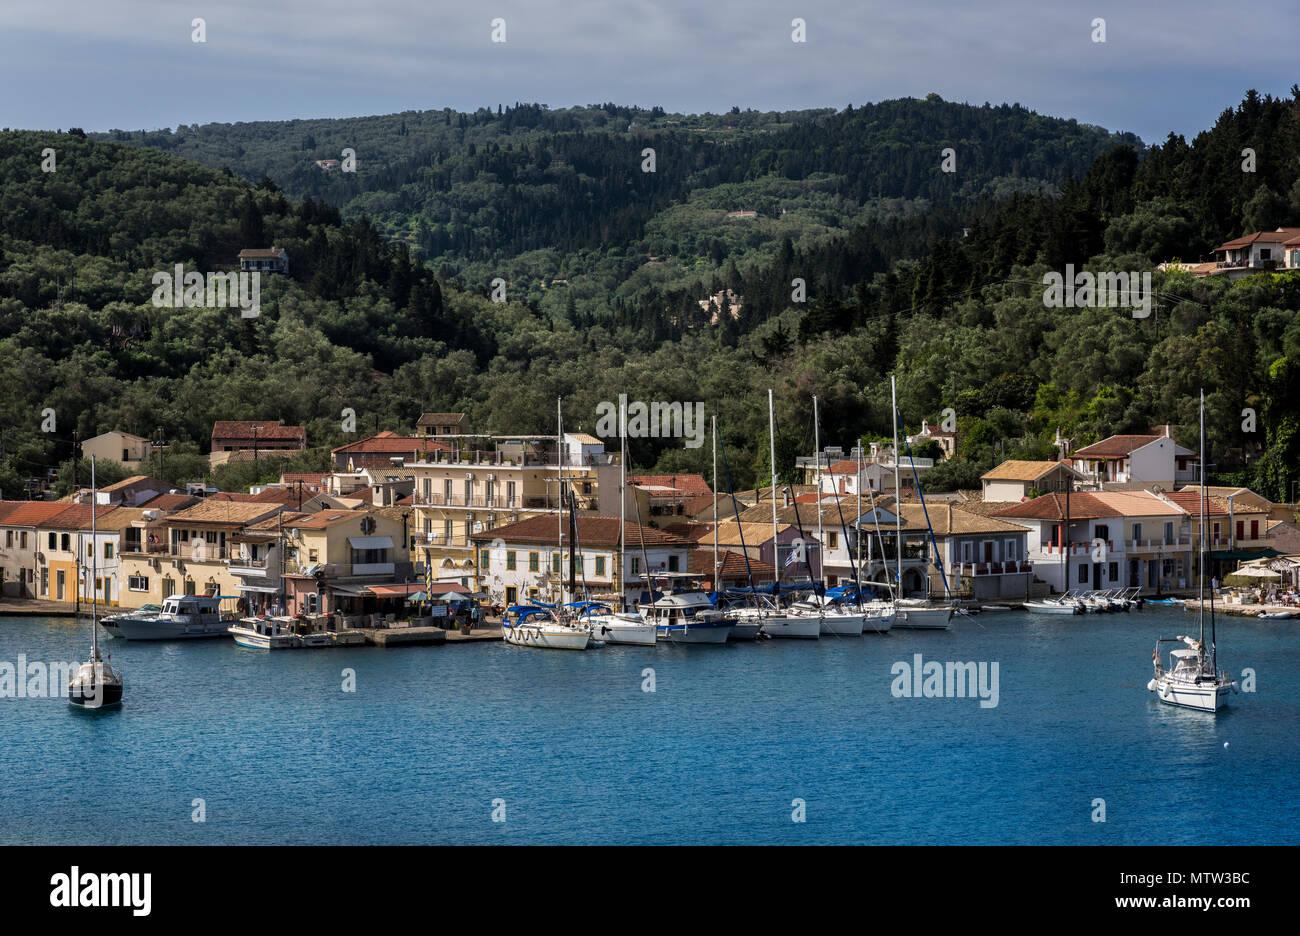 Lakka Harbour, Paxos. - Stock Image